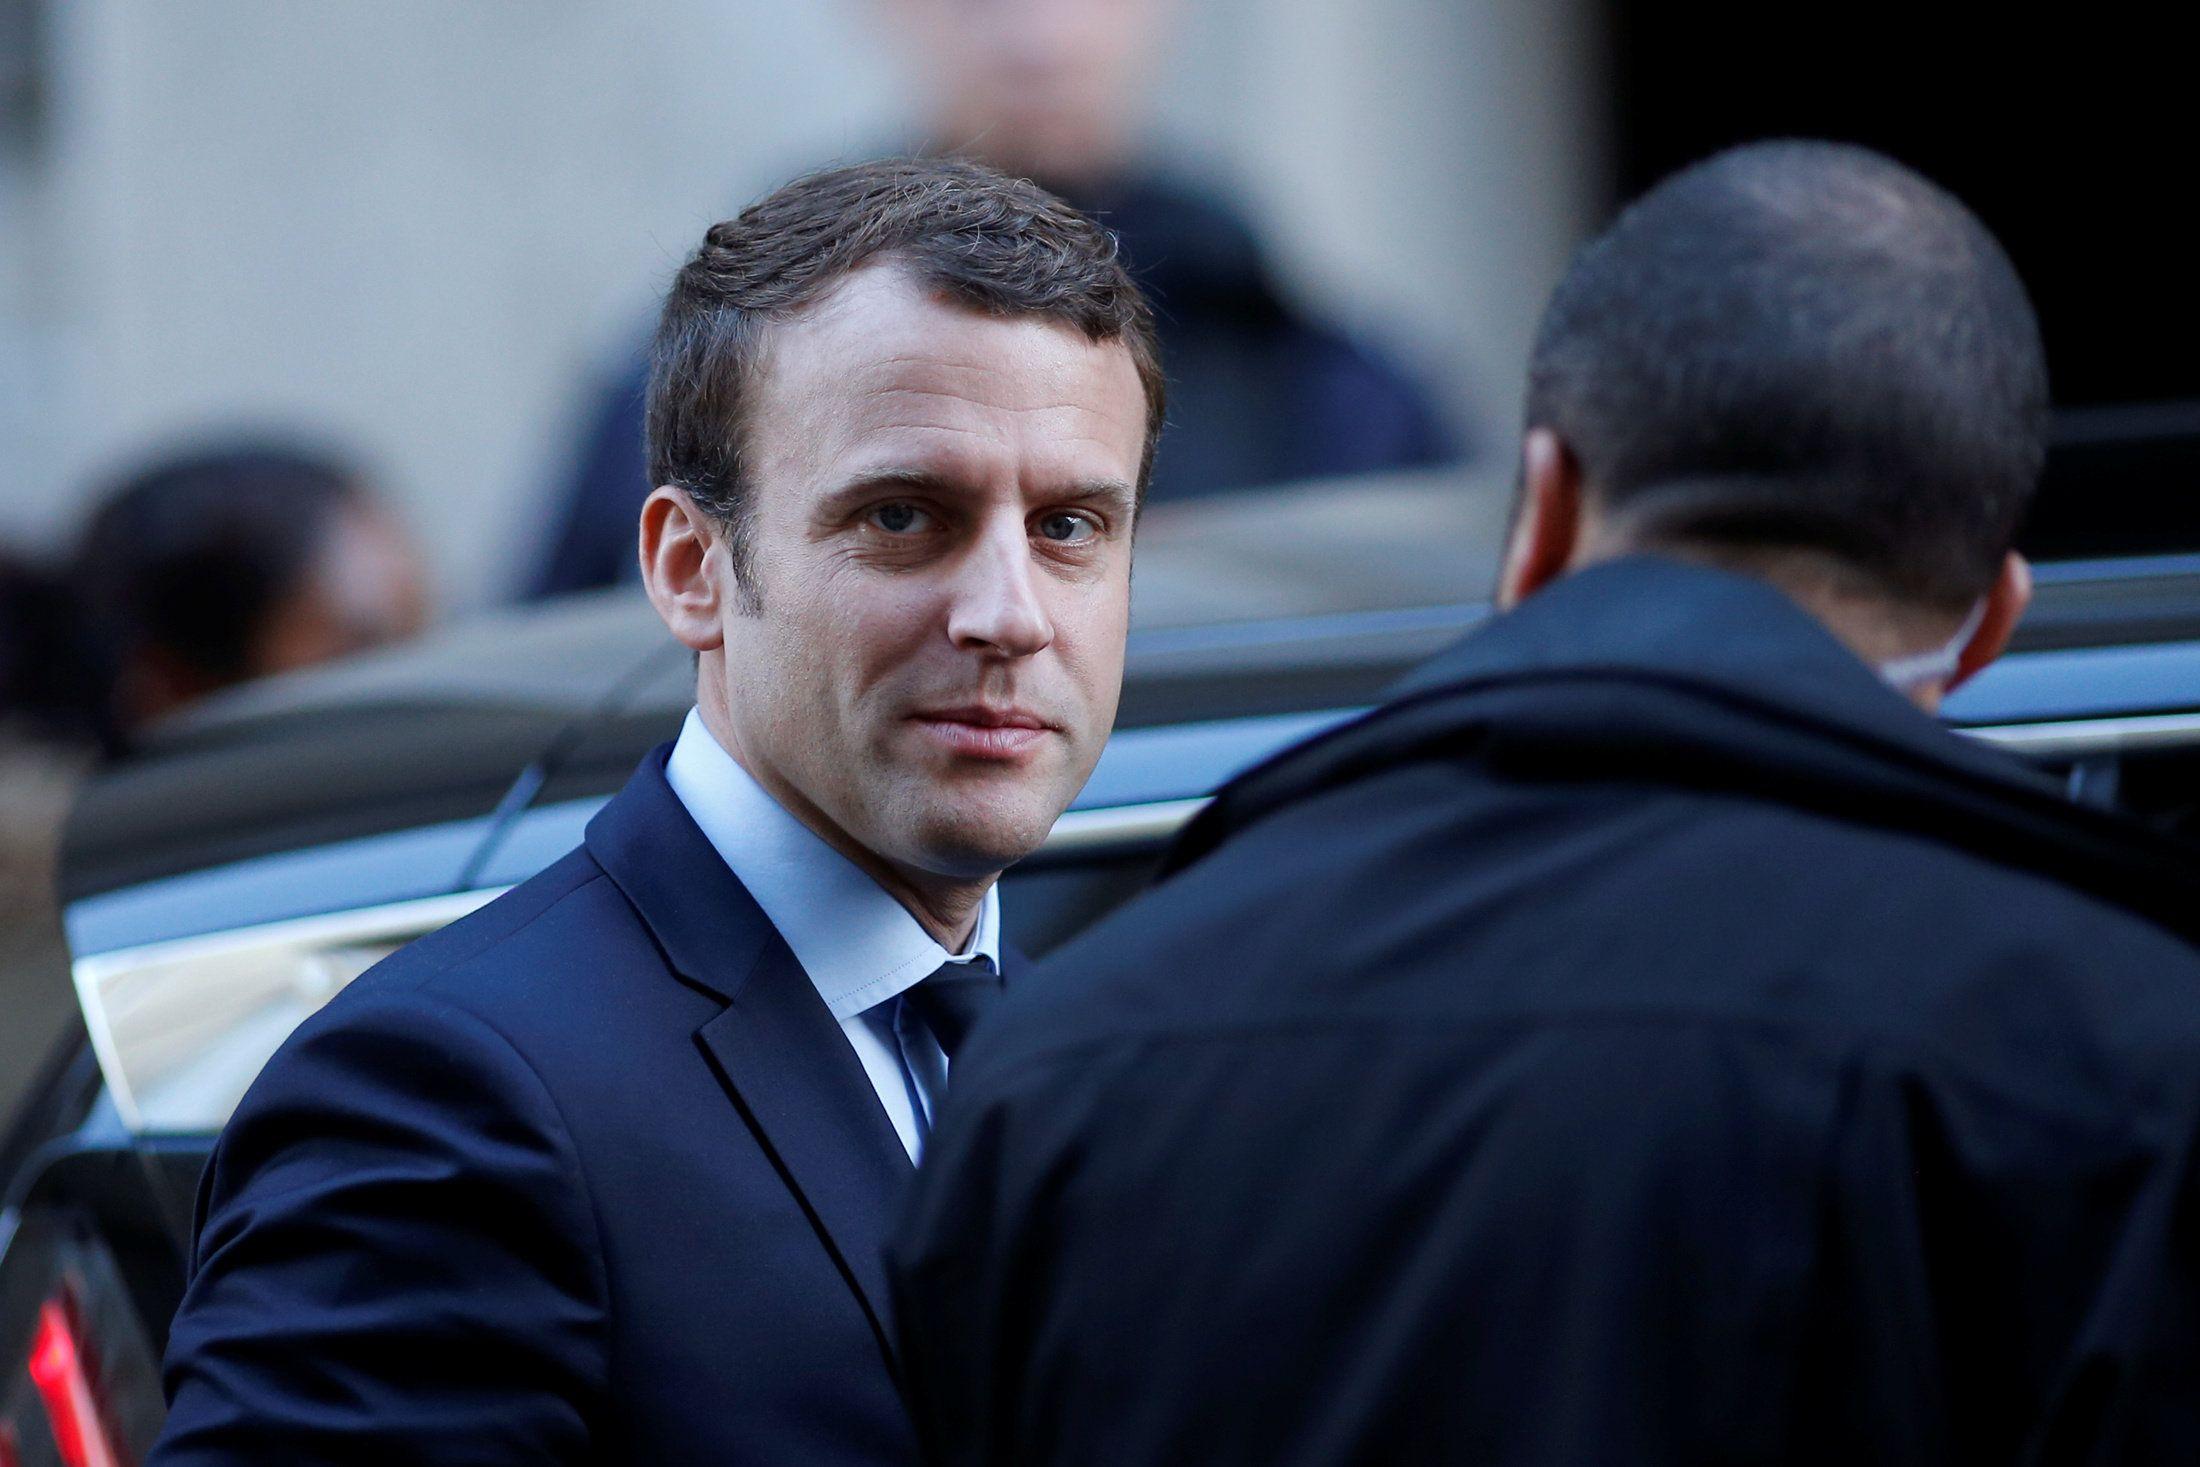 French President Emmanuel Macron. Reuters